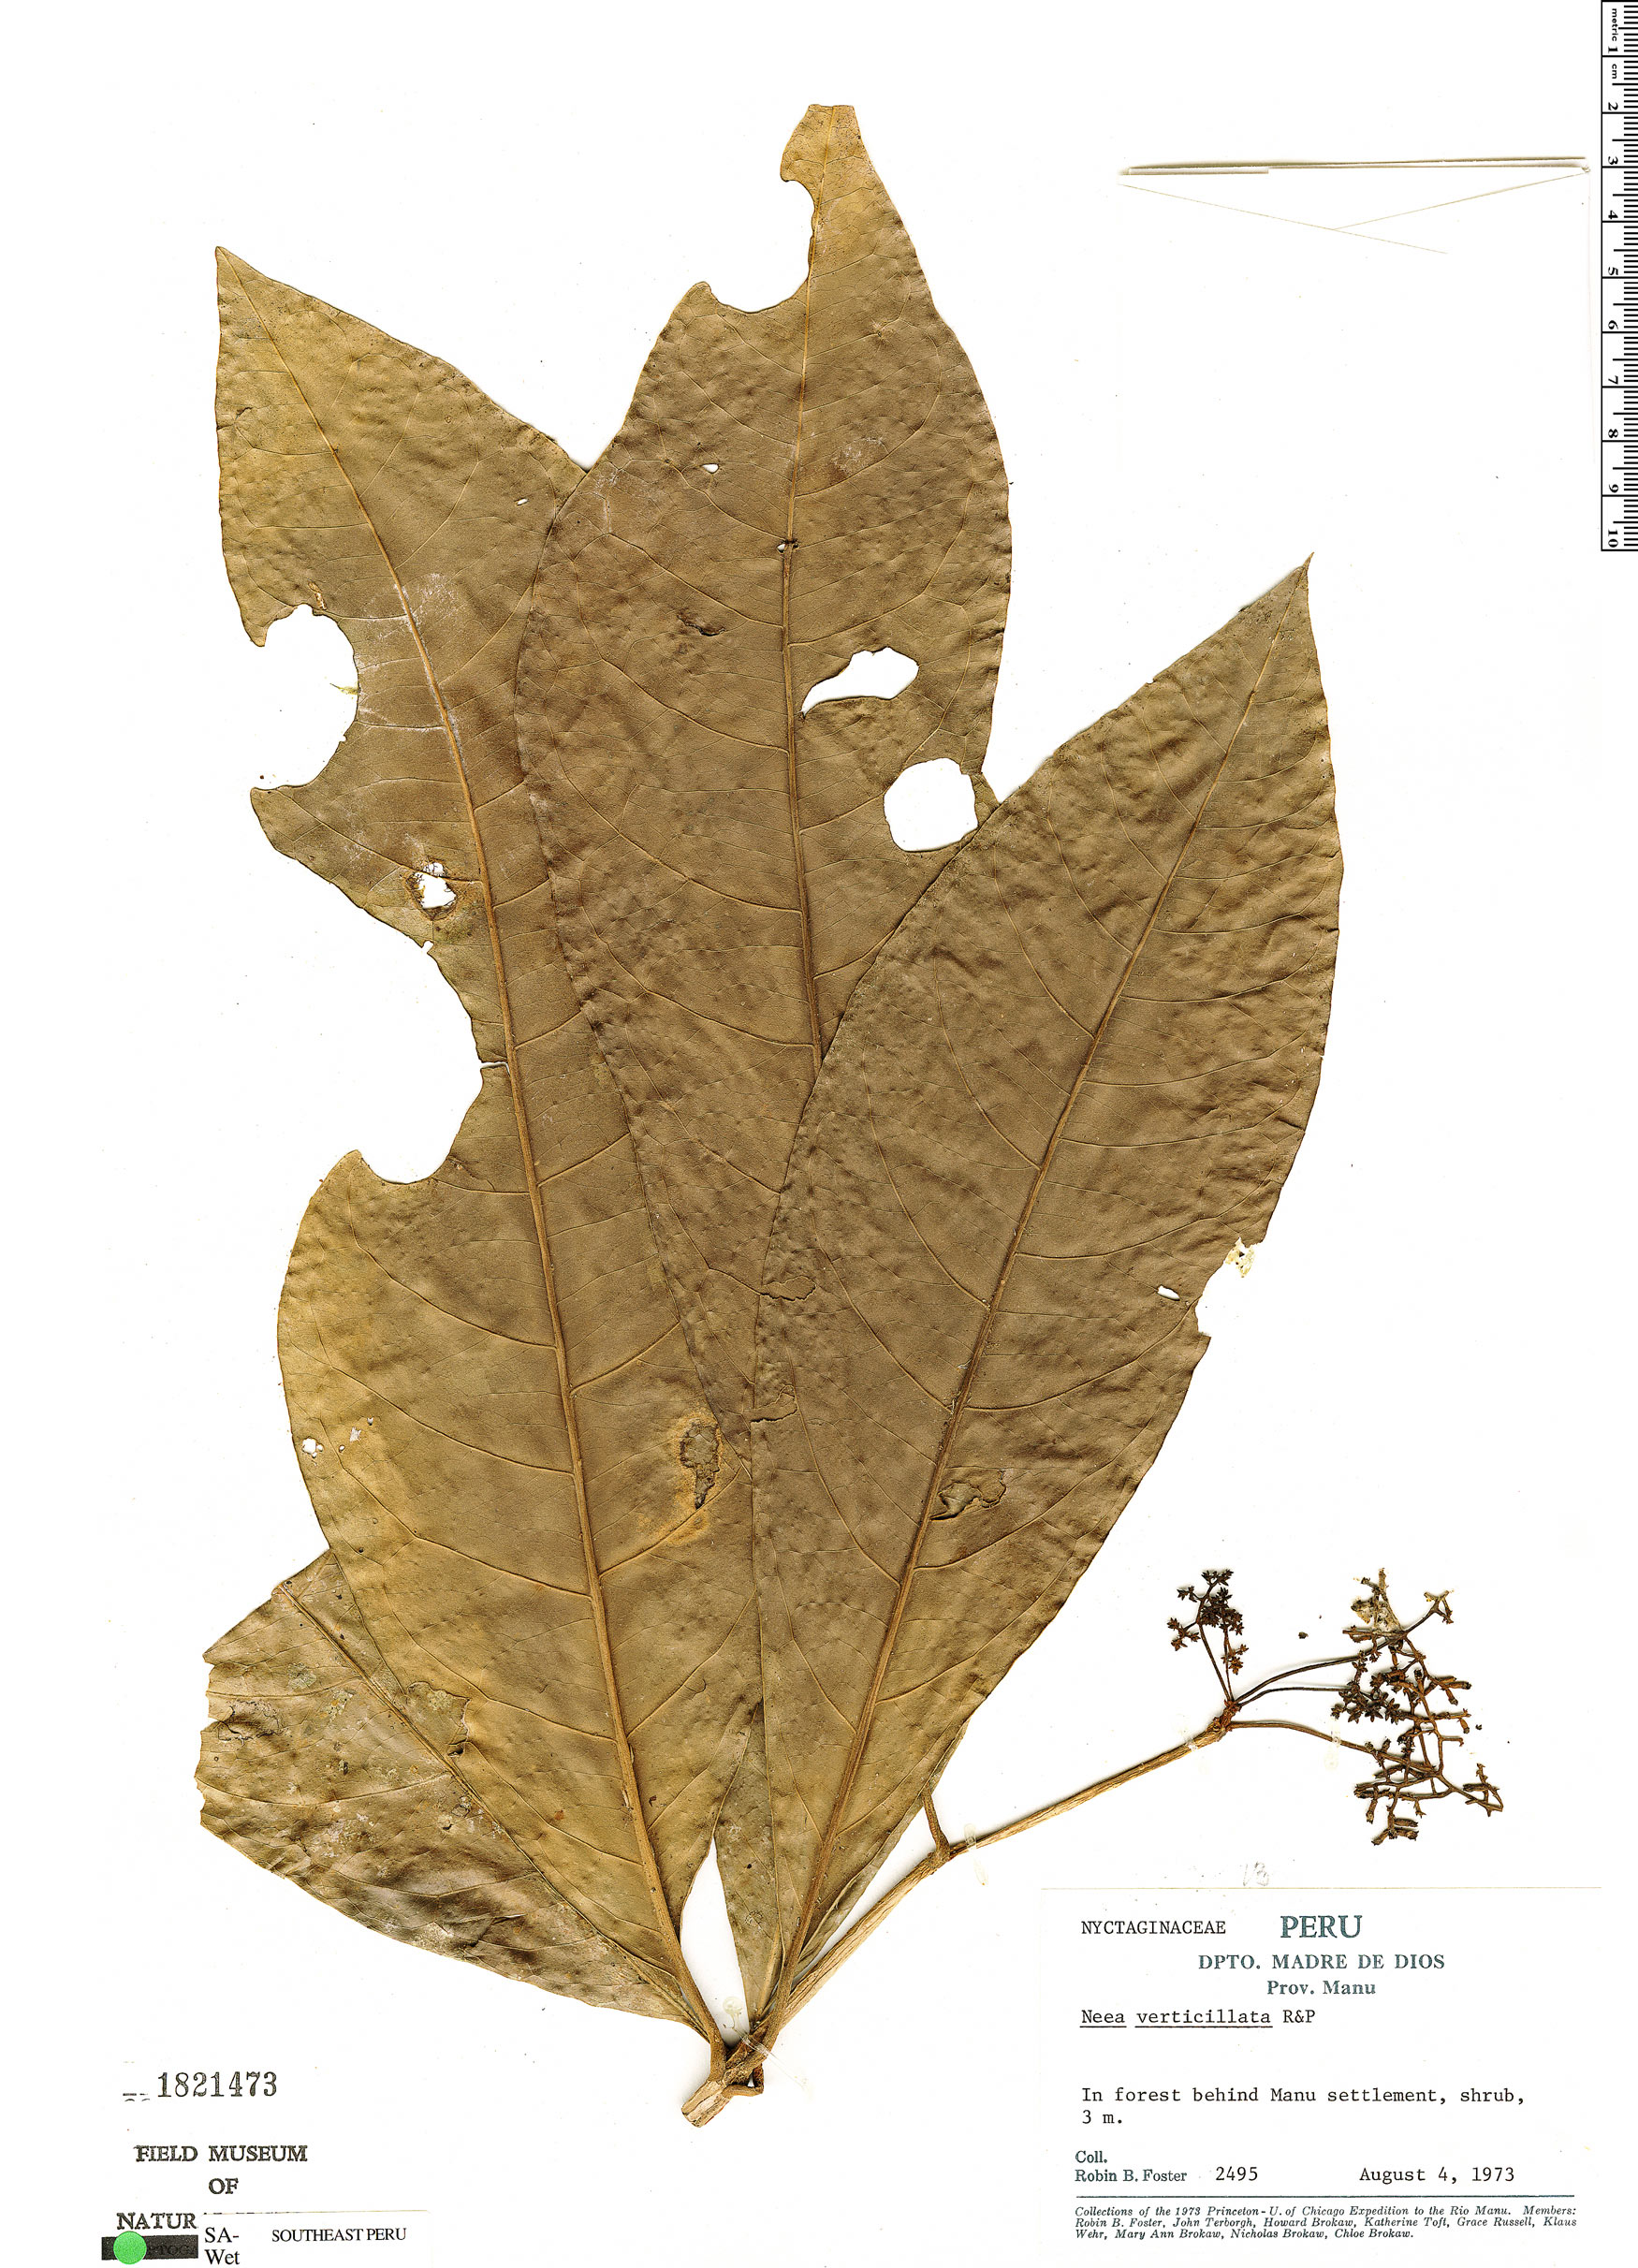 Espécime: Neea verticillata